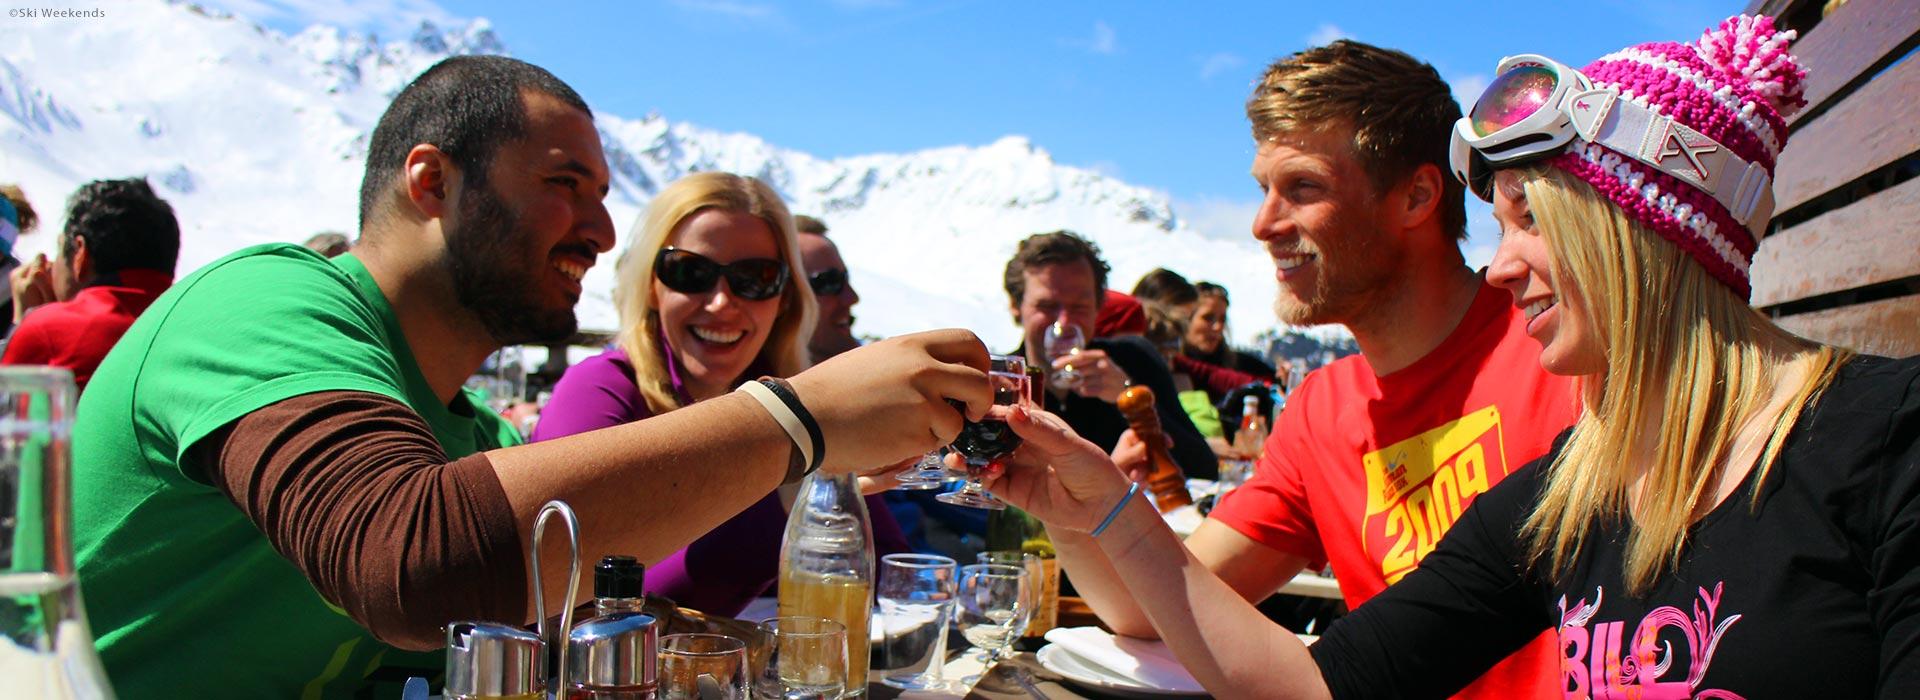 Alfresco lunch, short break ski holiday with freinds.